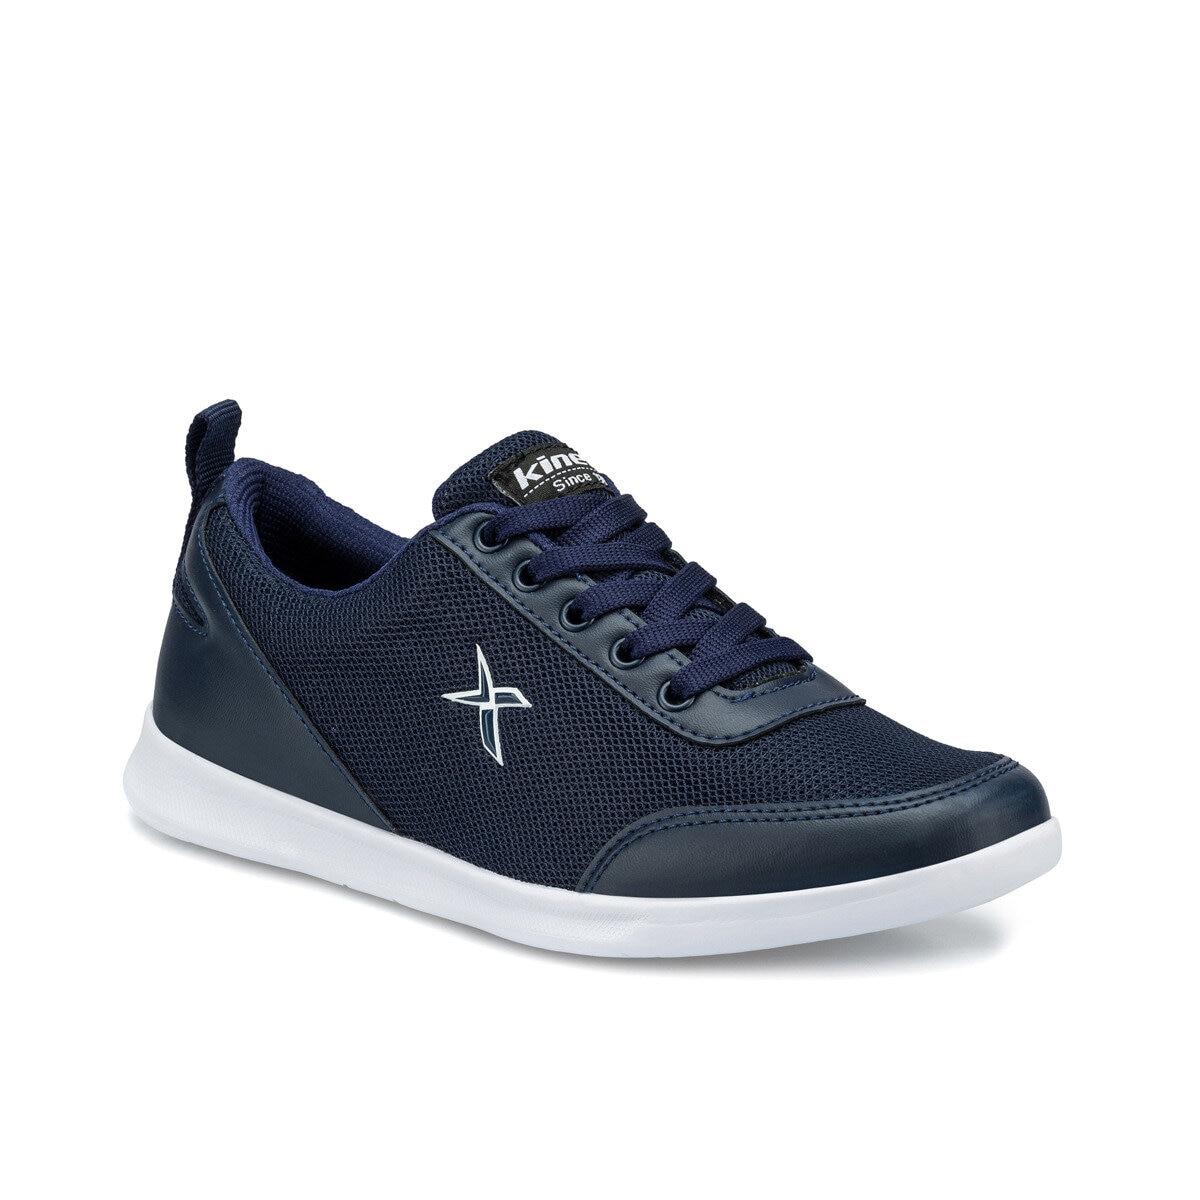 FLO Women Sneaker Navy Blue Pink Black White Fashion Breathable Comfortable Walking Shoes Female Footwear Sneaker Shoes Кроссовки женские LINDA KINETIX